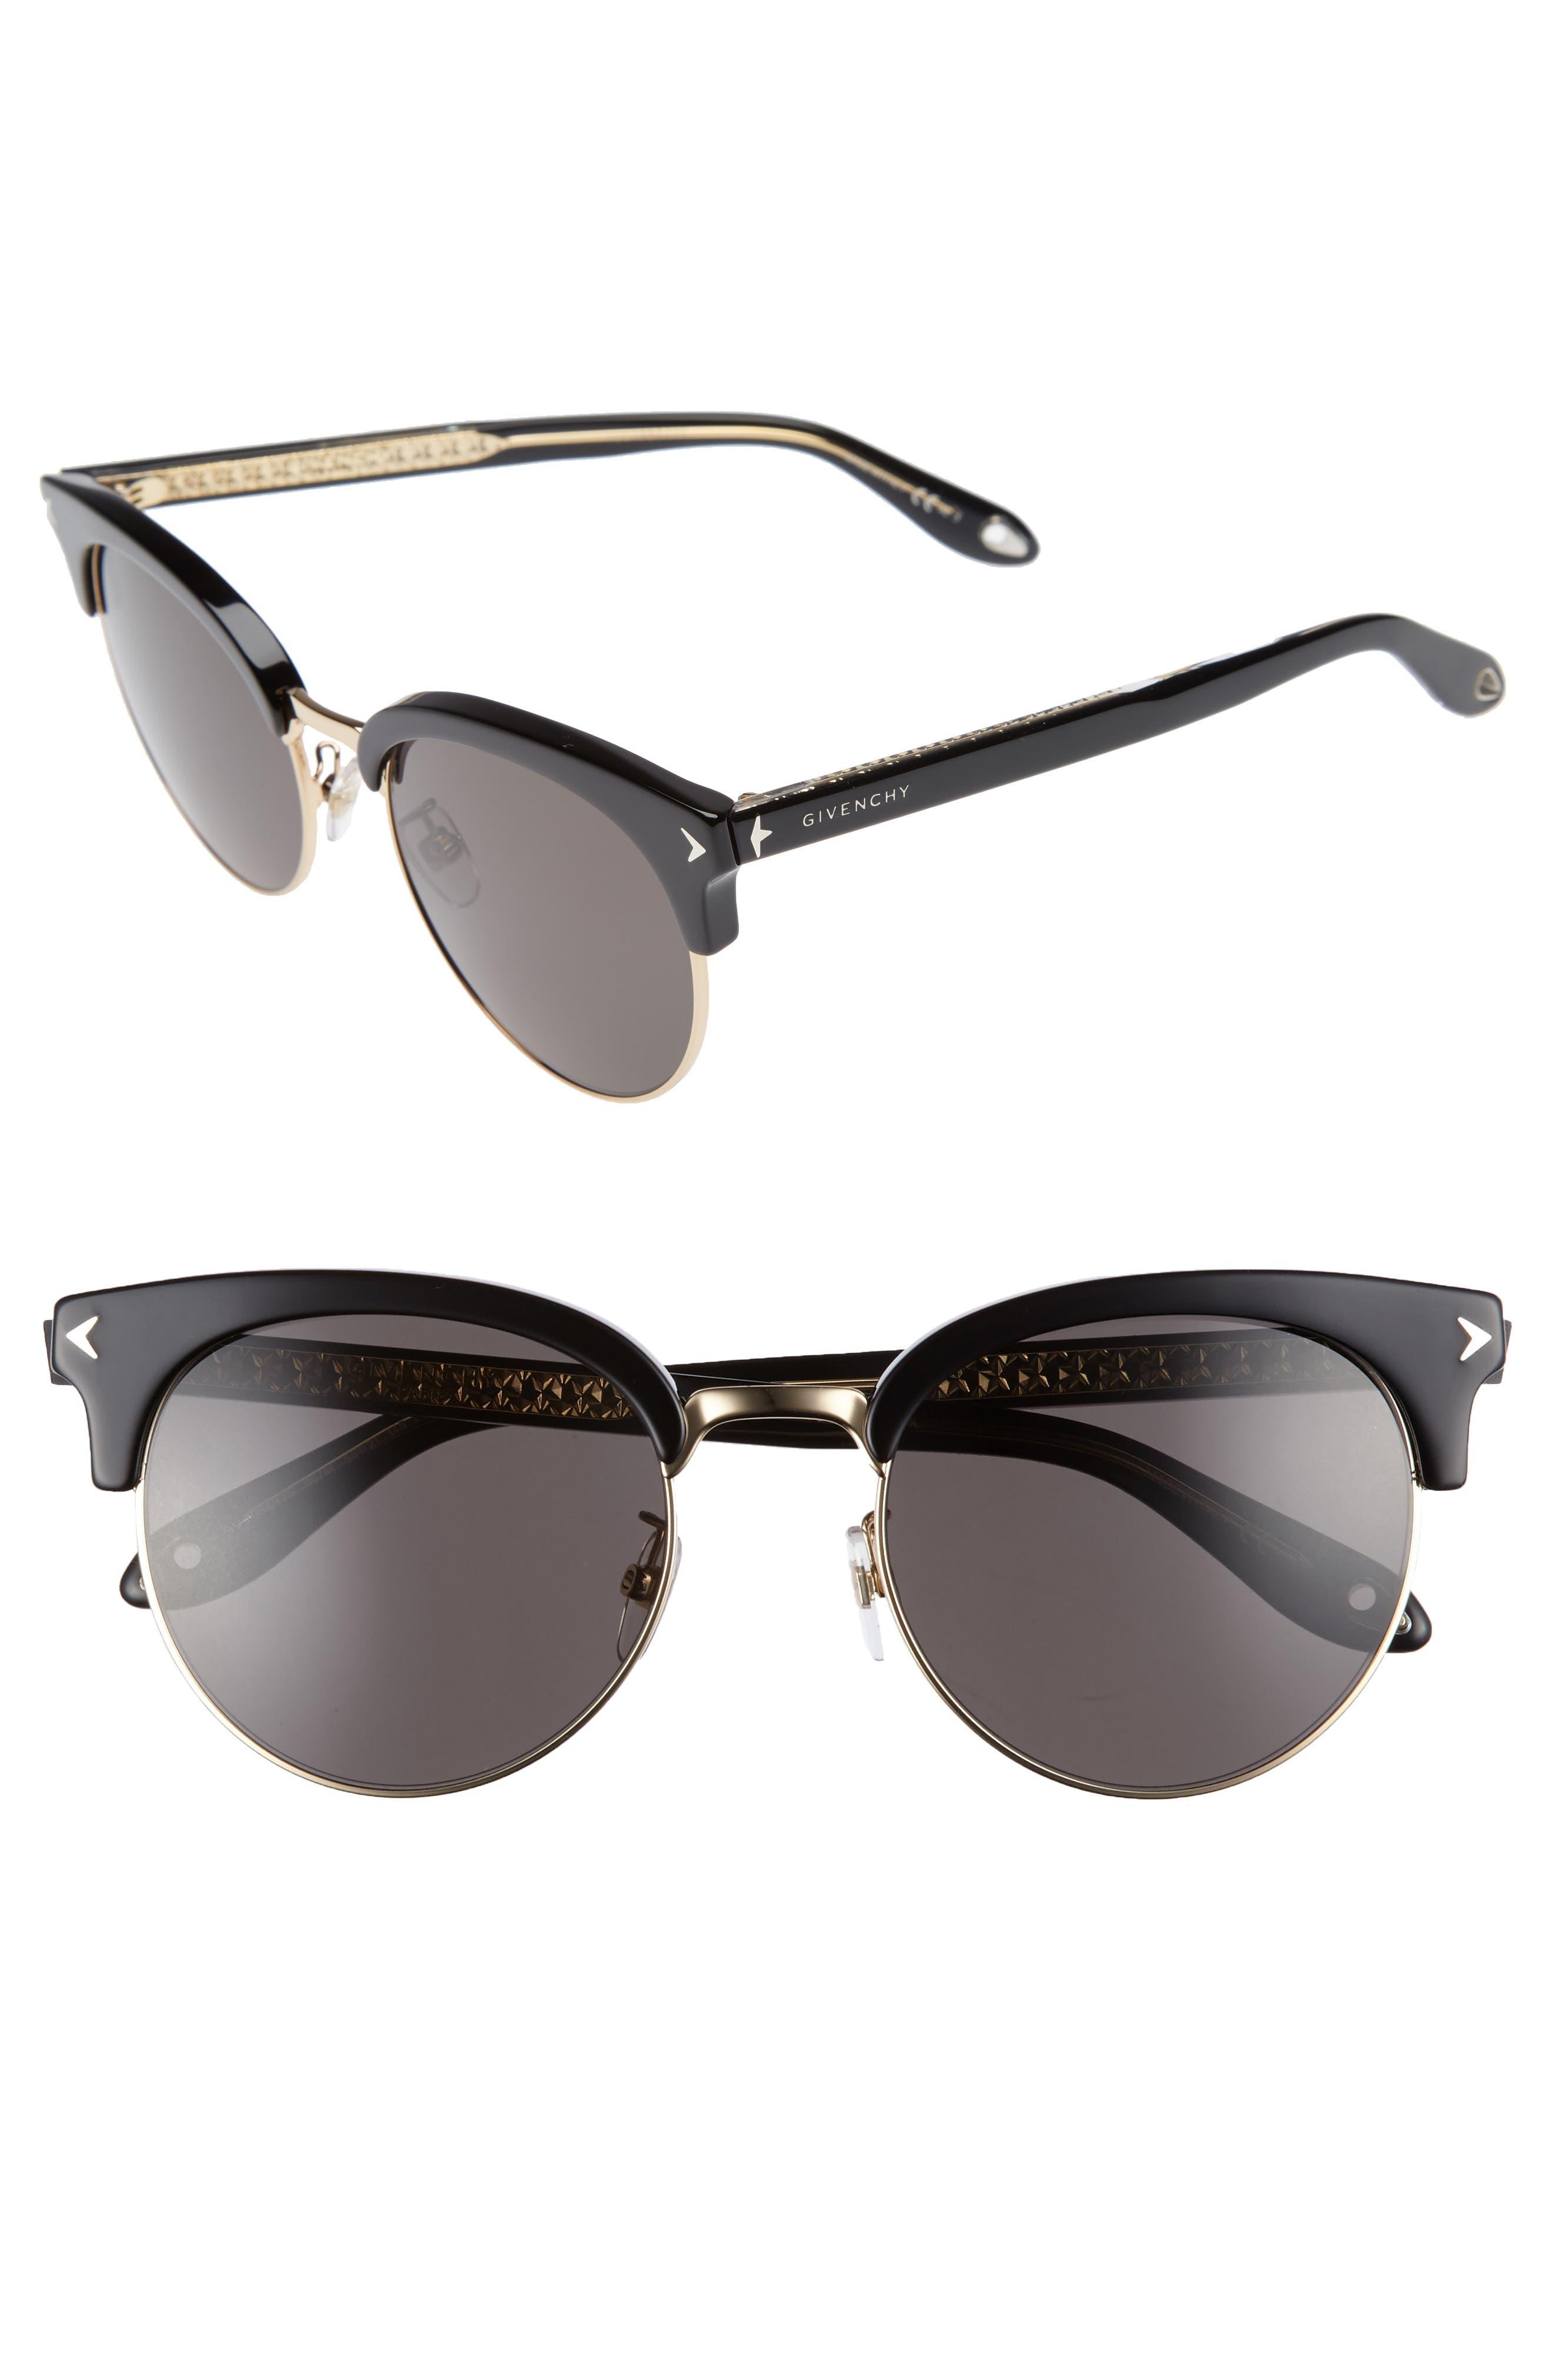 Main Image - Givenchy 55mm Sunglasses